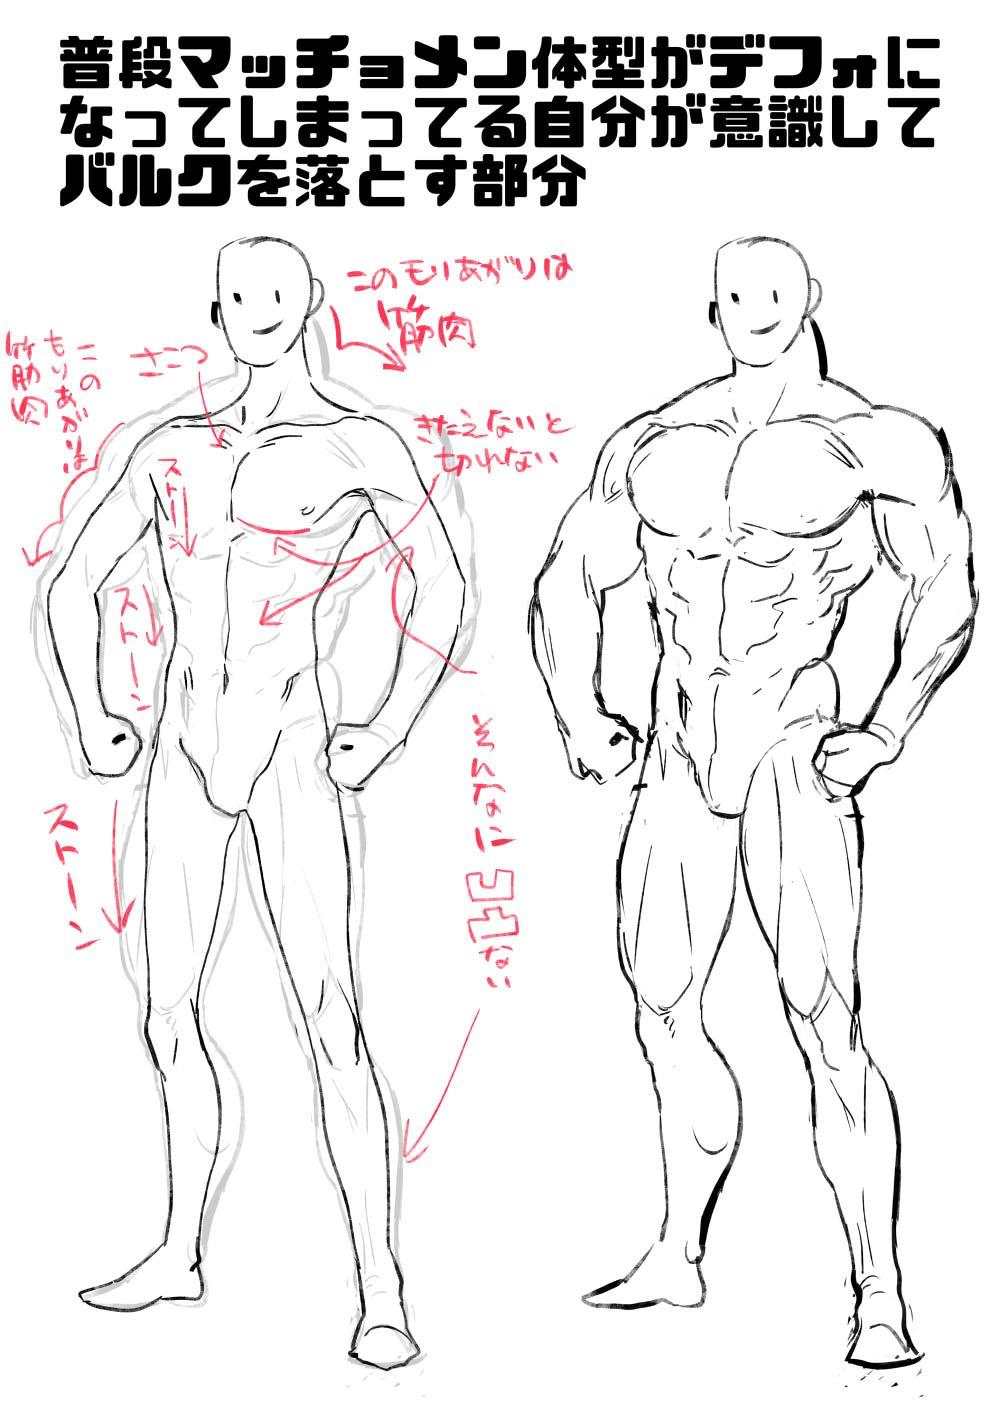 Pin de lou zhen en 人体画法 | Pinterest | Anatomía, Tutorial de ...